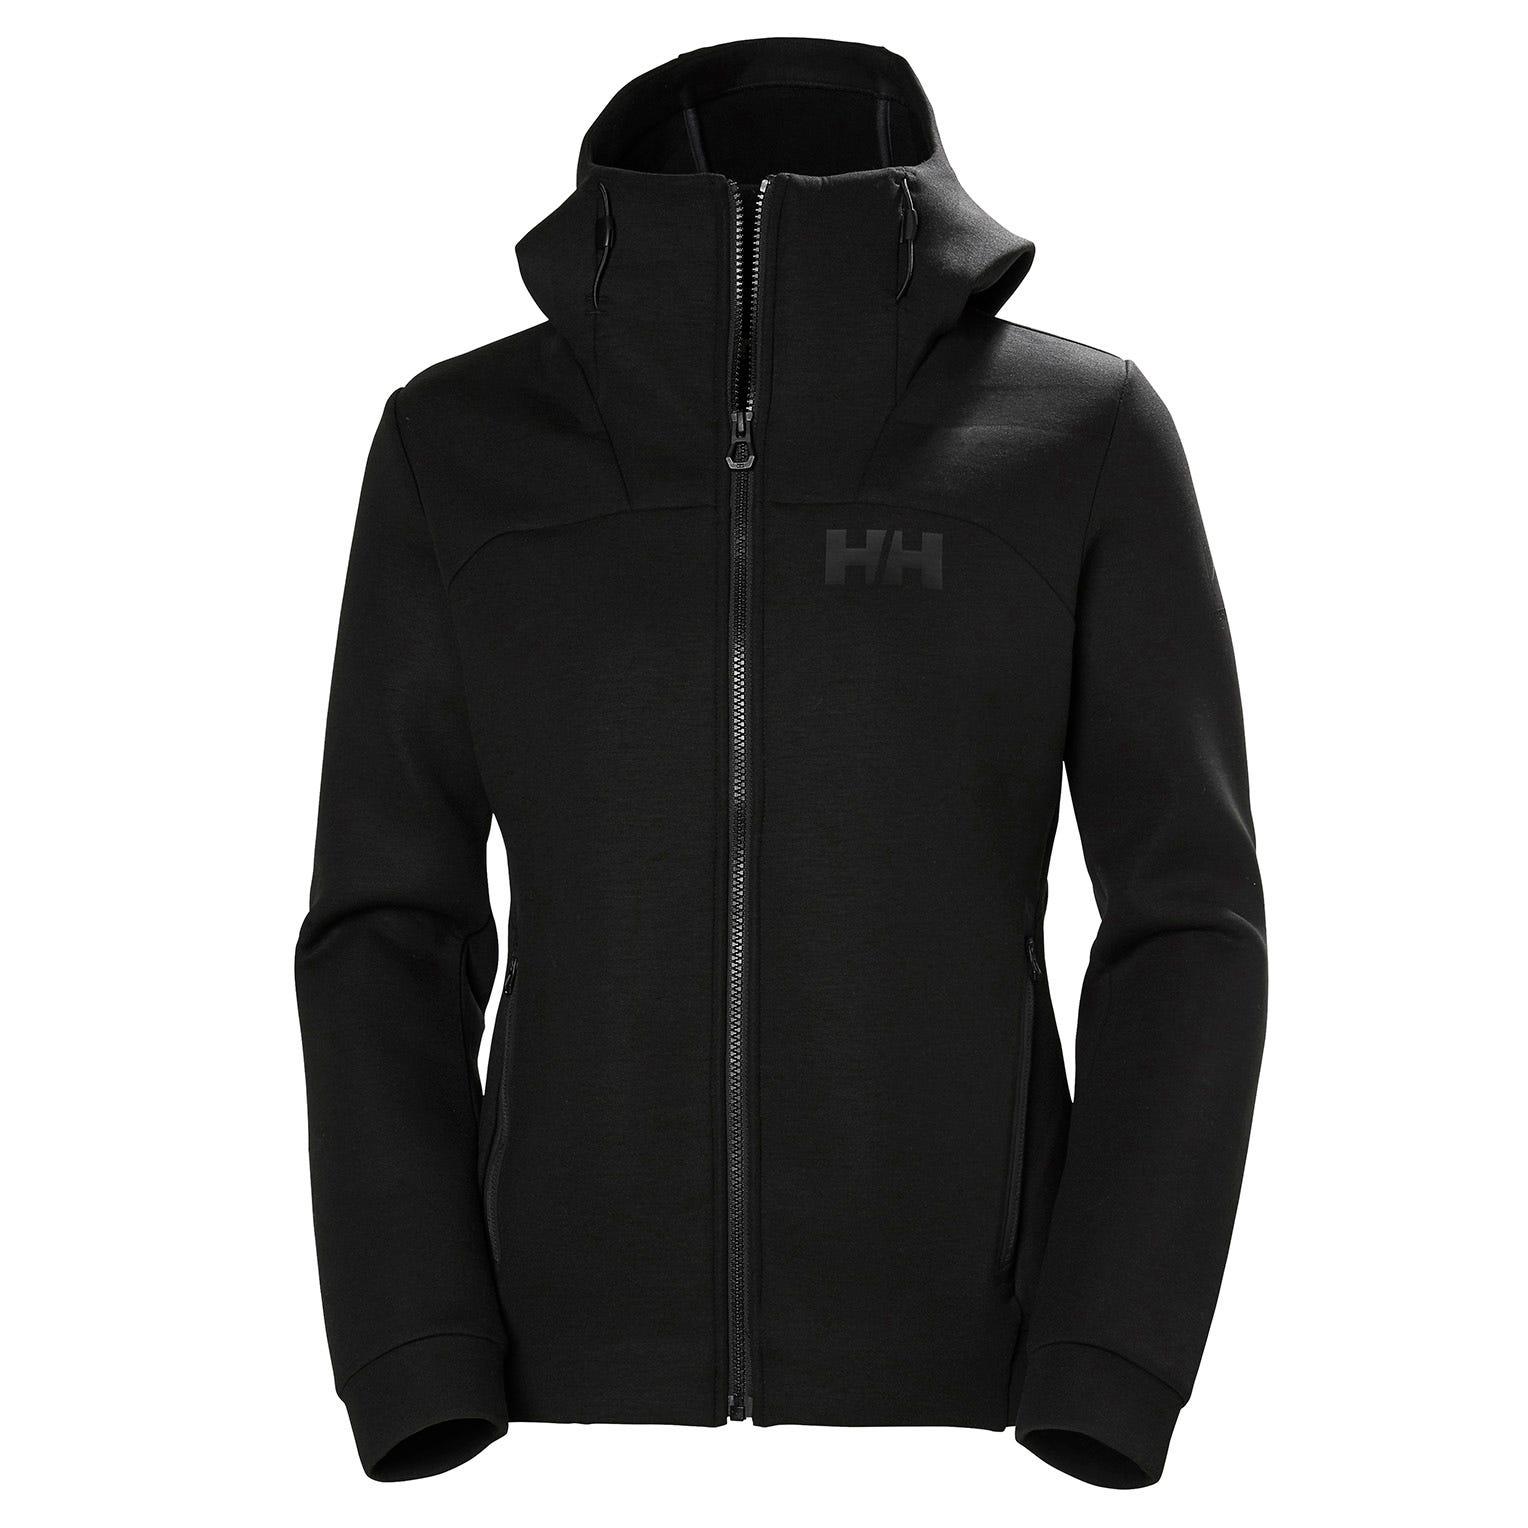 Helly Hansen Womens Hp Ocean Swt Sailing Jacket Black XL